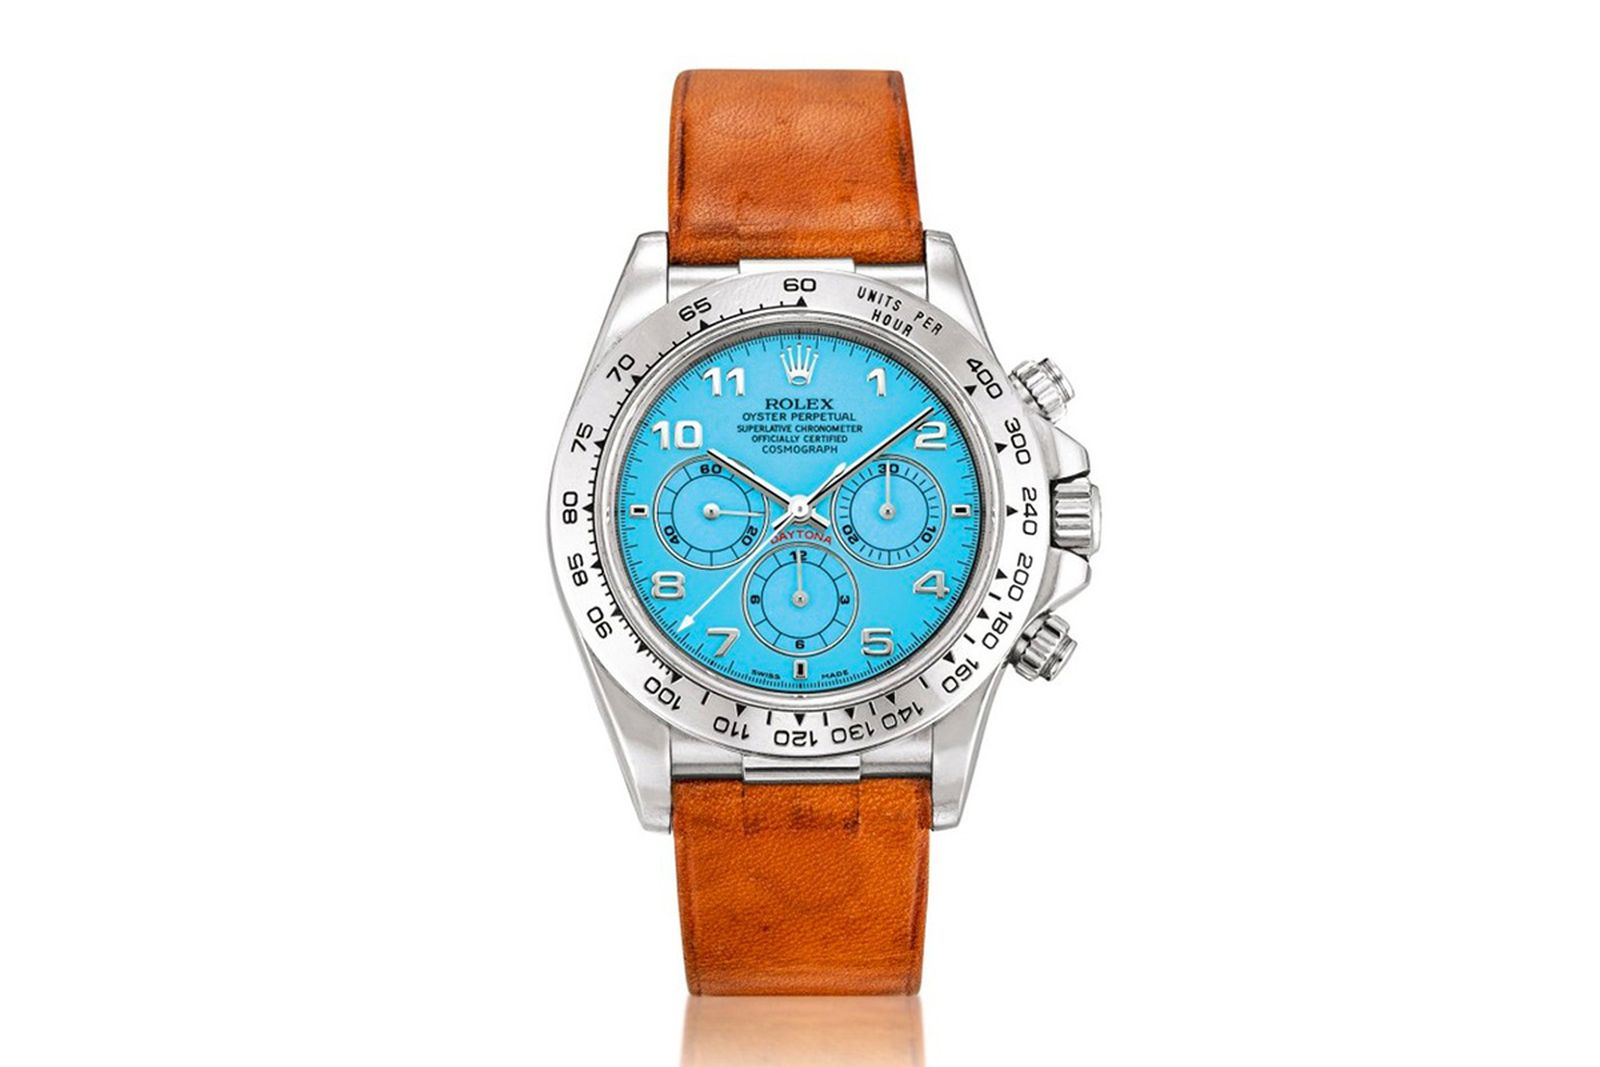 rolex-zenith-daytona-turquoise-dial-auction-03